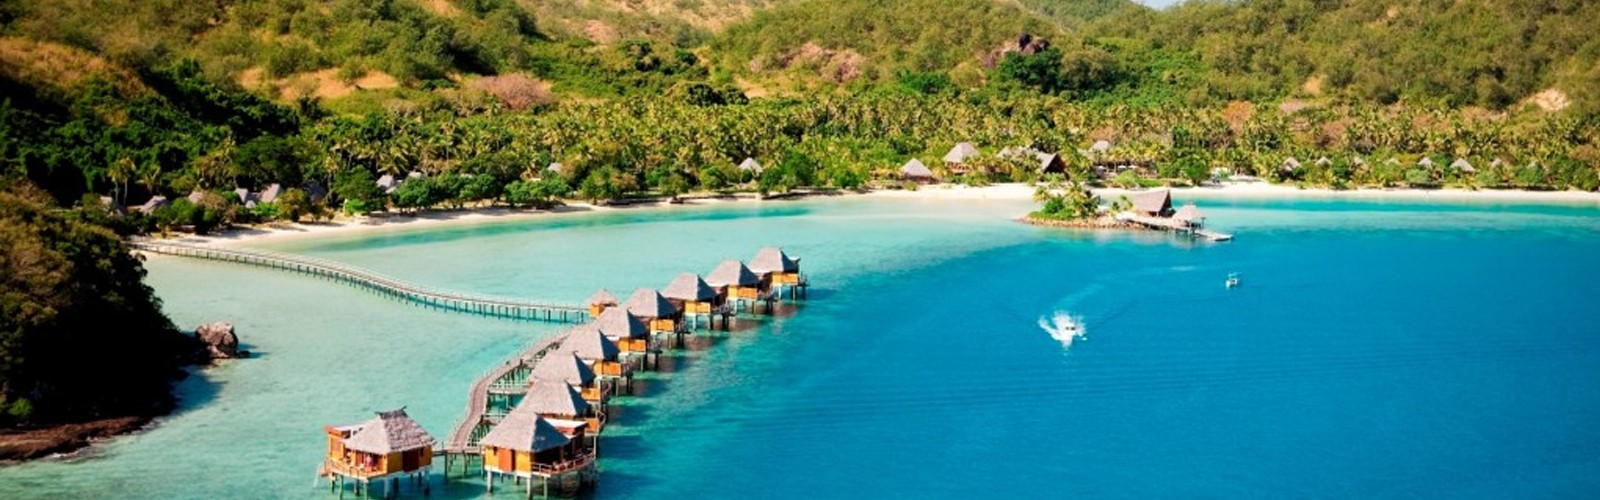 The Most Romantic Beach Locations Honeymoon Dreams